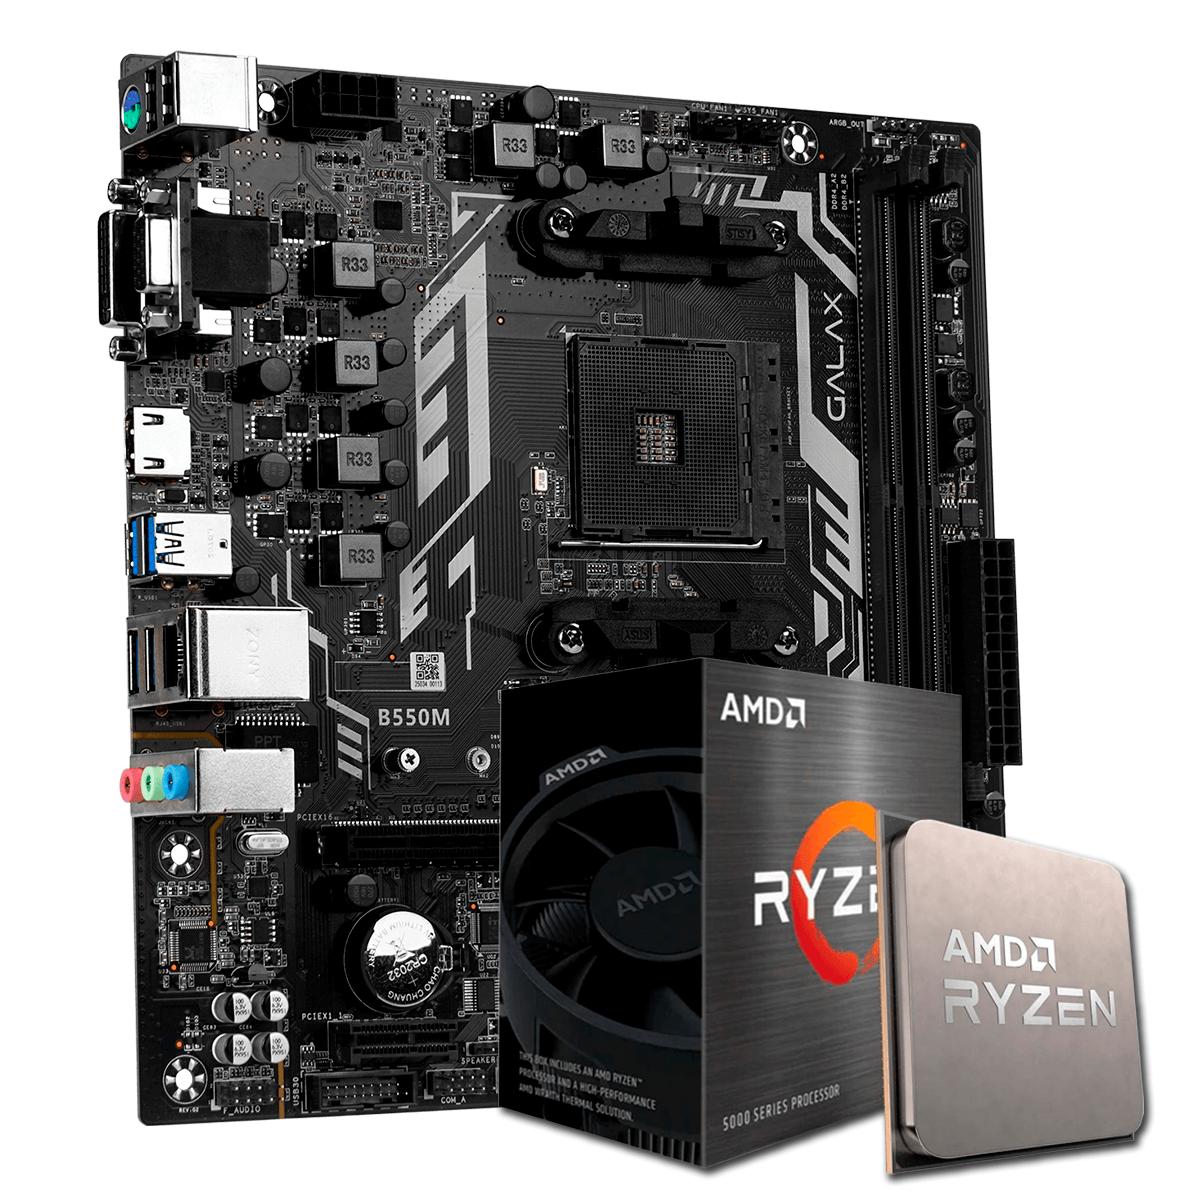 Kit Upgrade, AMD Ryzen 5 5600X, Galax B550M